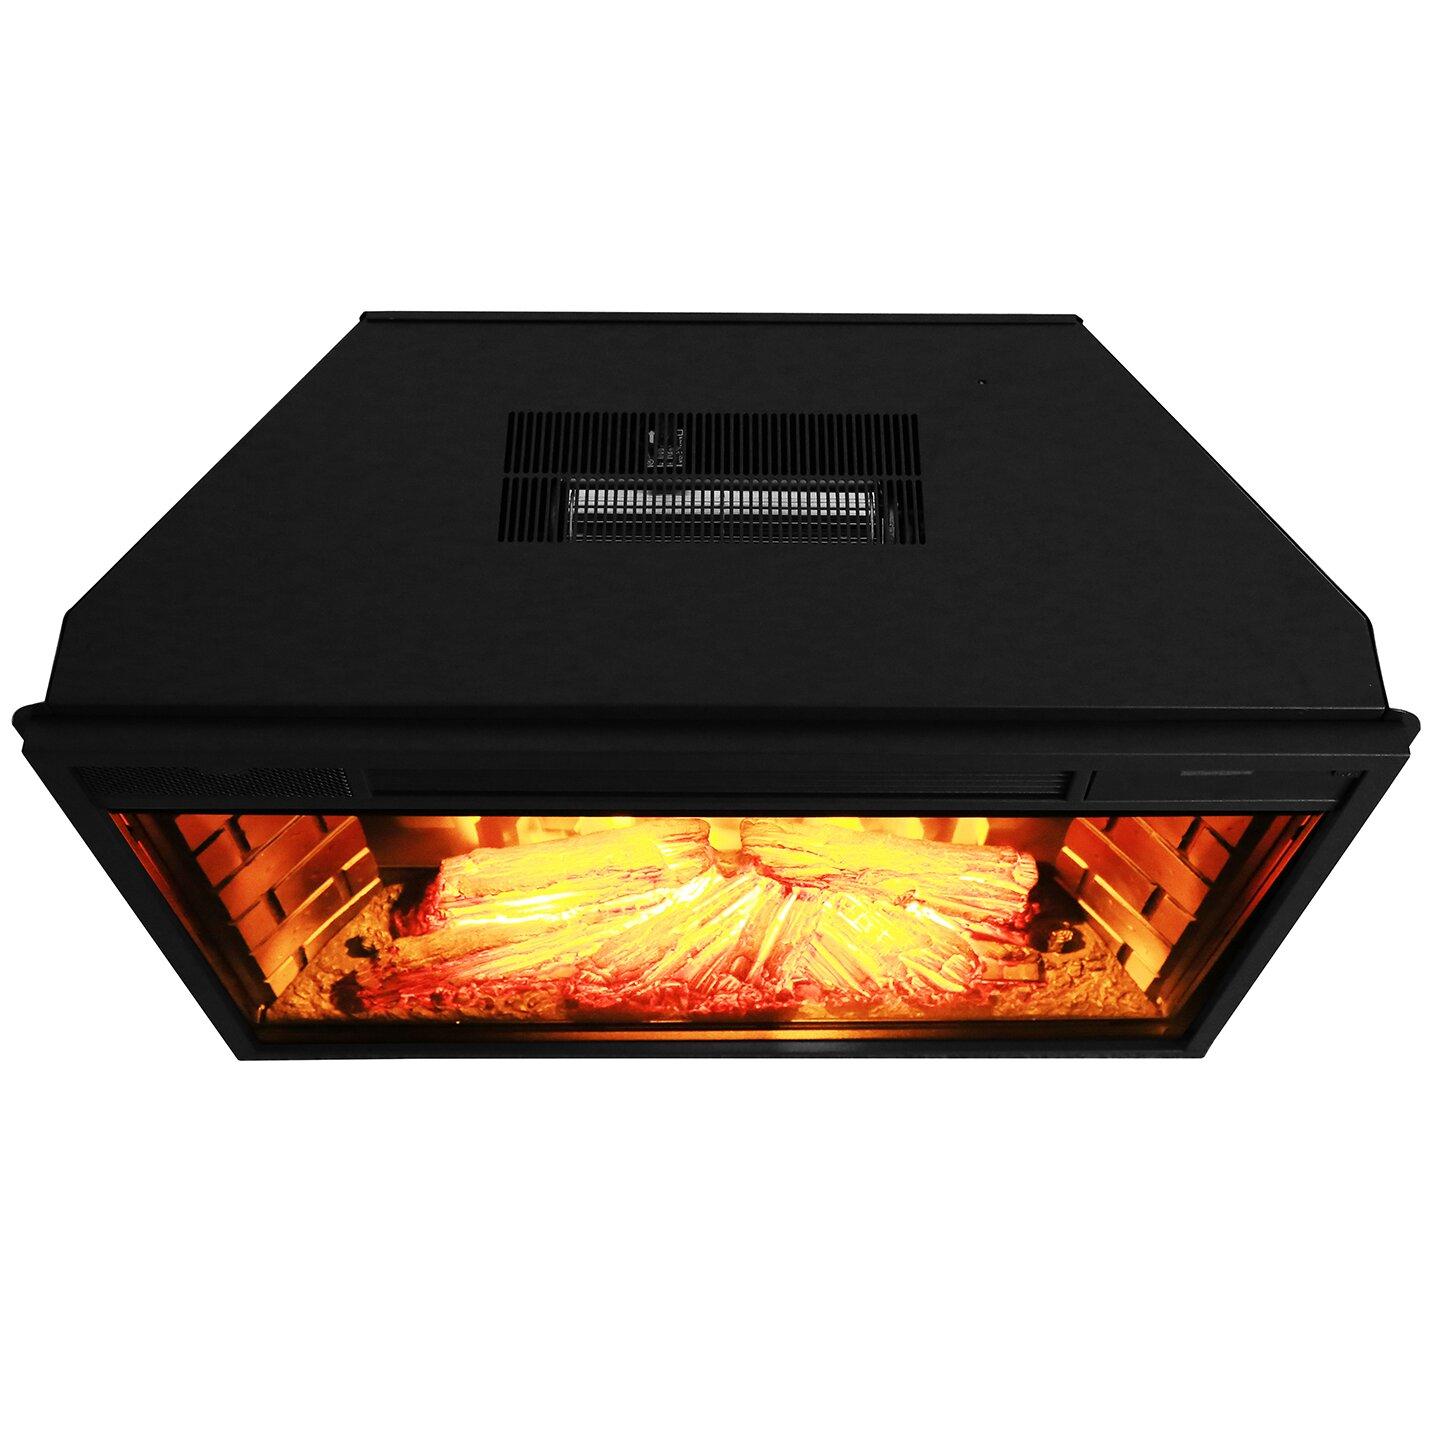 Akdy Wall Mount Electric Fireplace Insert Amp Reviews Wayfair